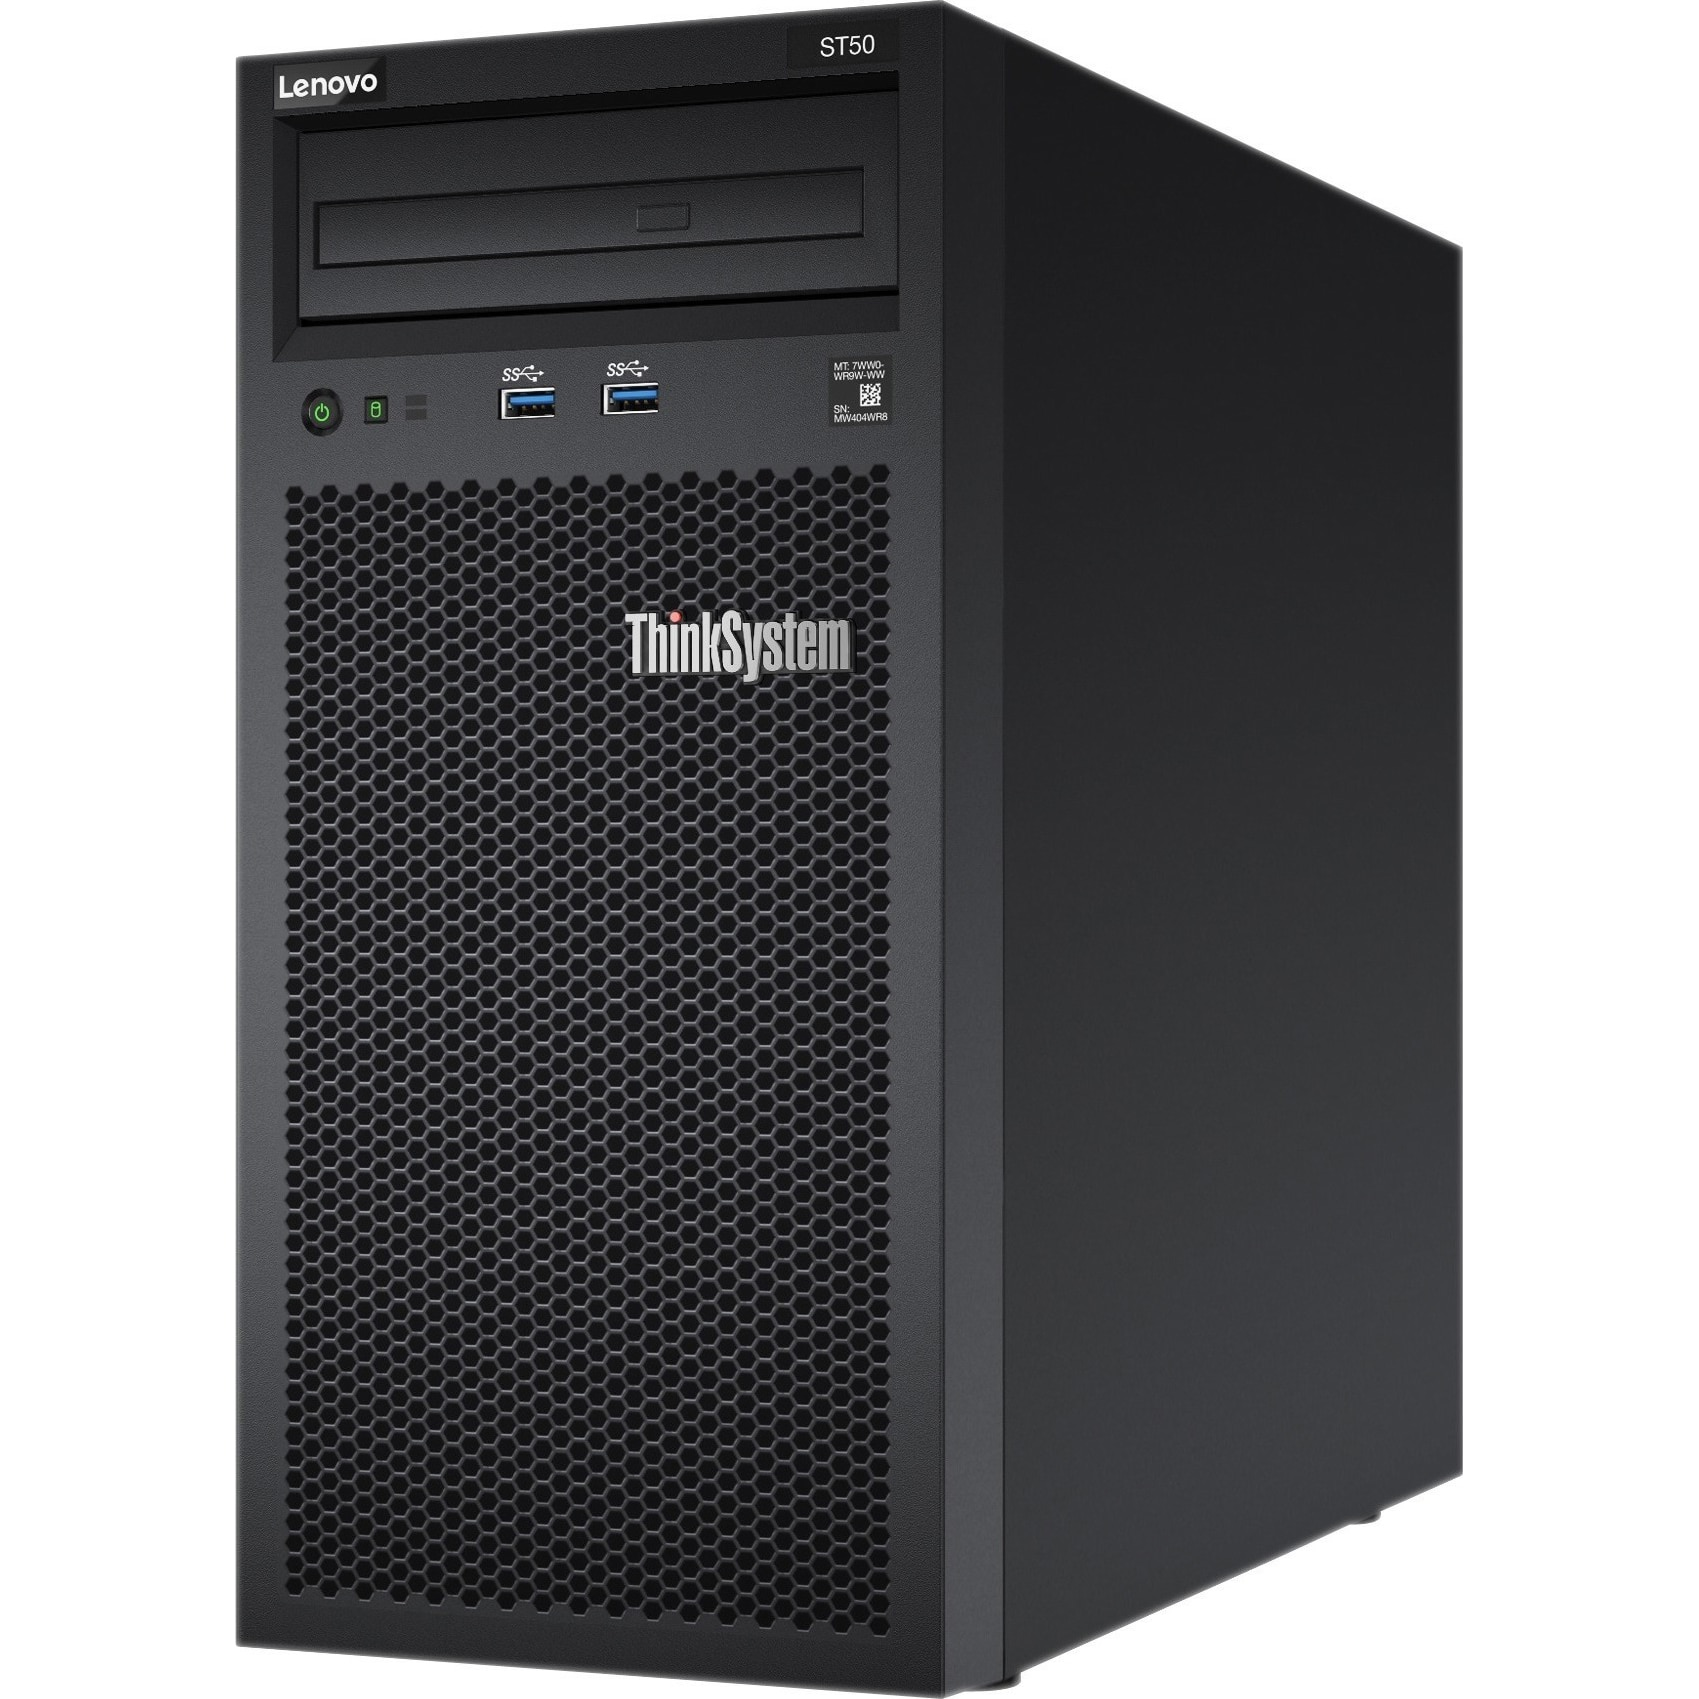 "Fotografie Sistem Server Lenovo ST50 E-2124G (4C 3.4GHz 8MB Cache), 8GB RAM, O/B, 3.5"" NHS (4)"